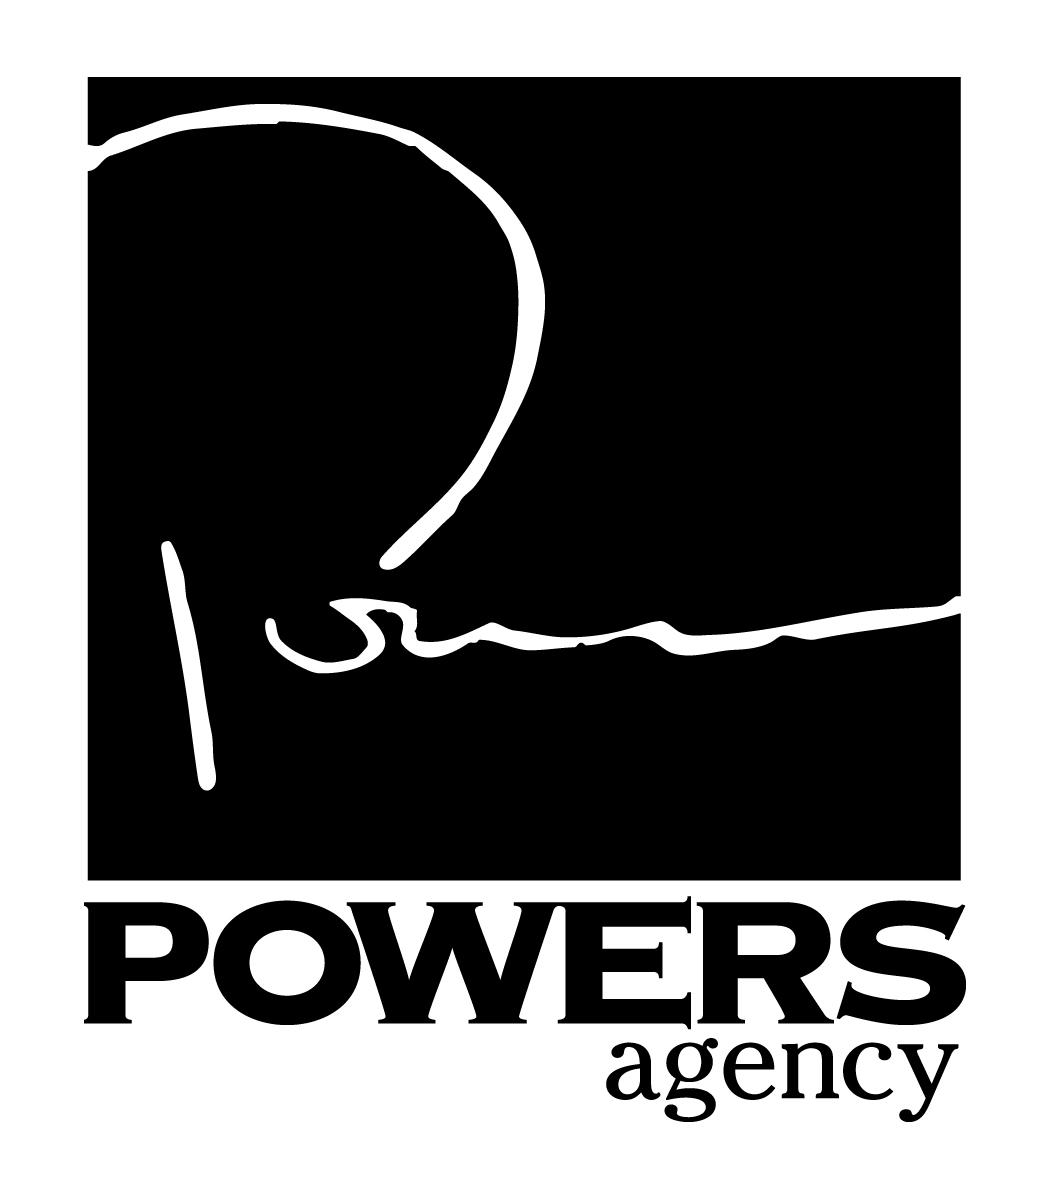 Powers Agency